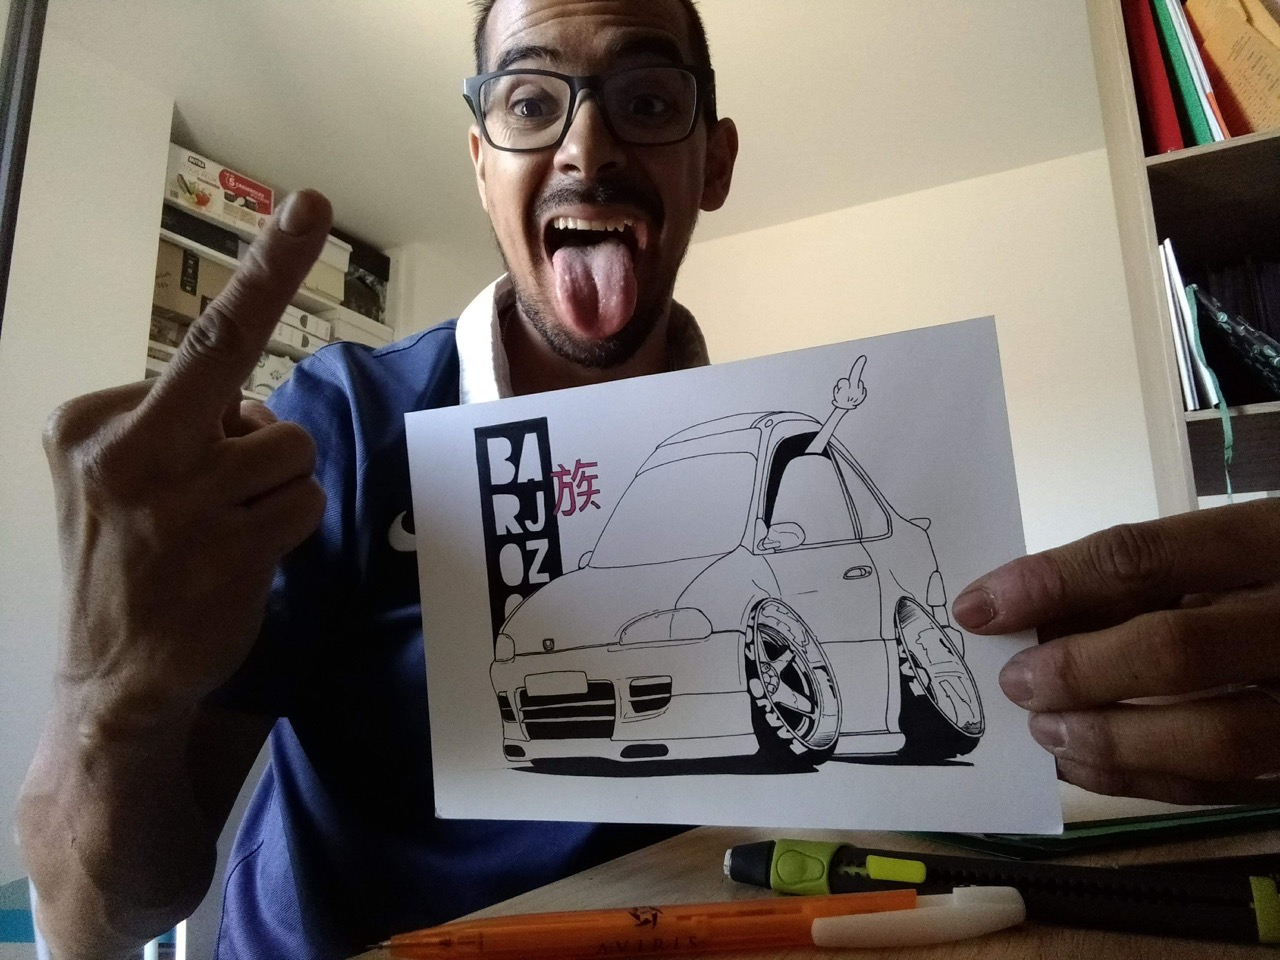 #Petrolhead : Frédéric Rodriguez le talent sauce Barjozoku 17